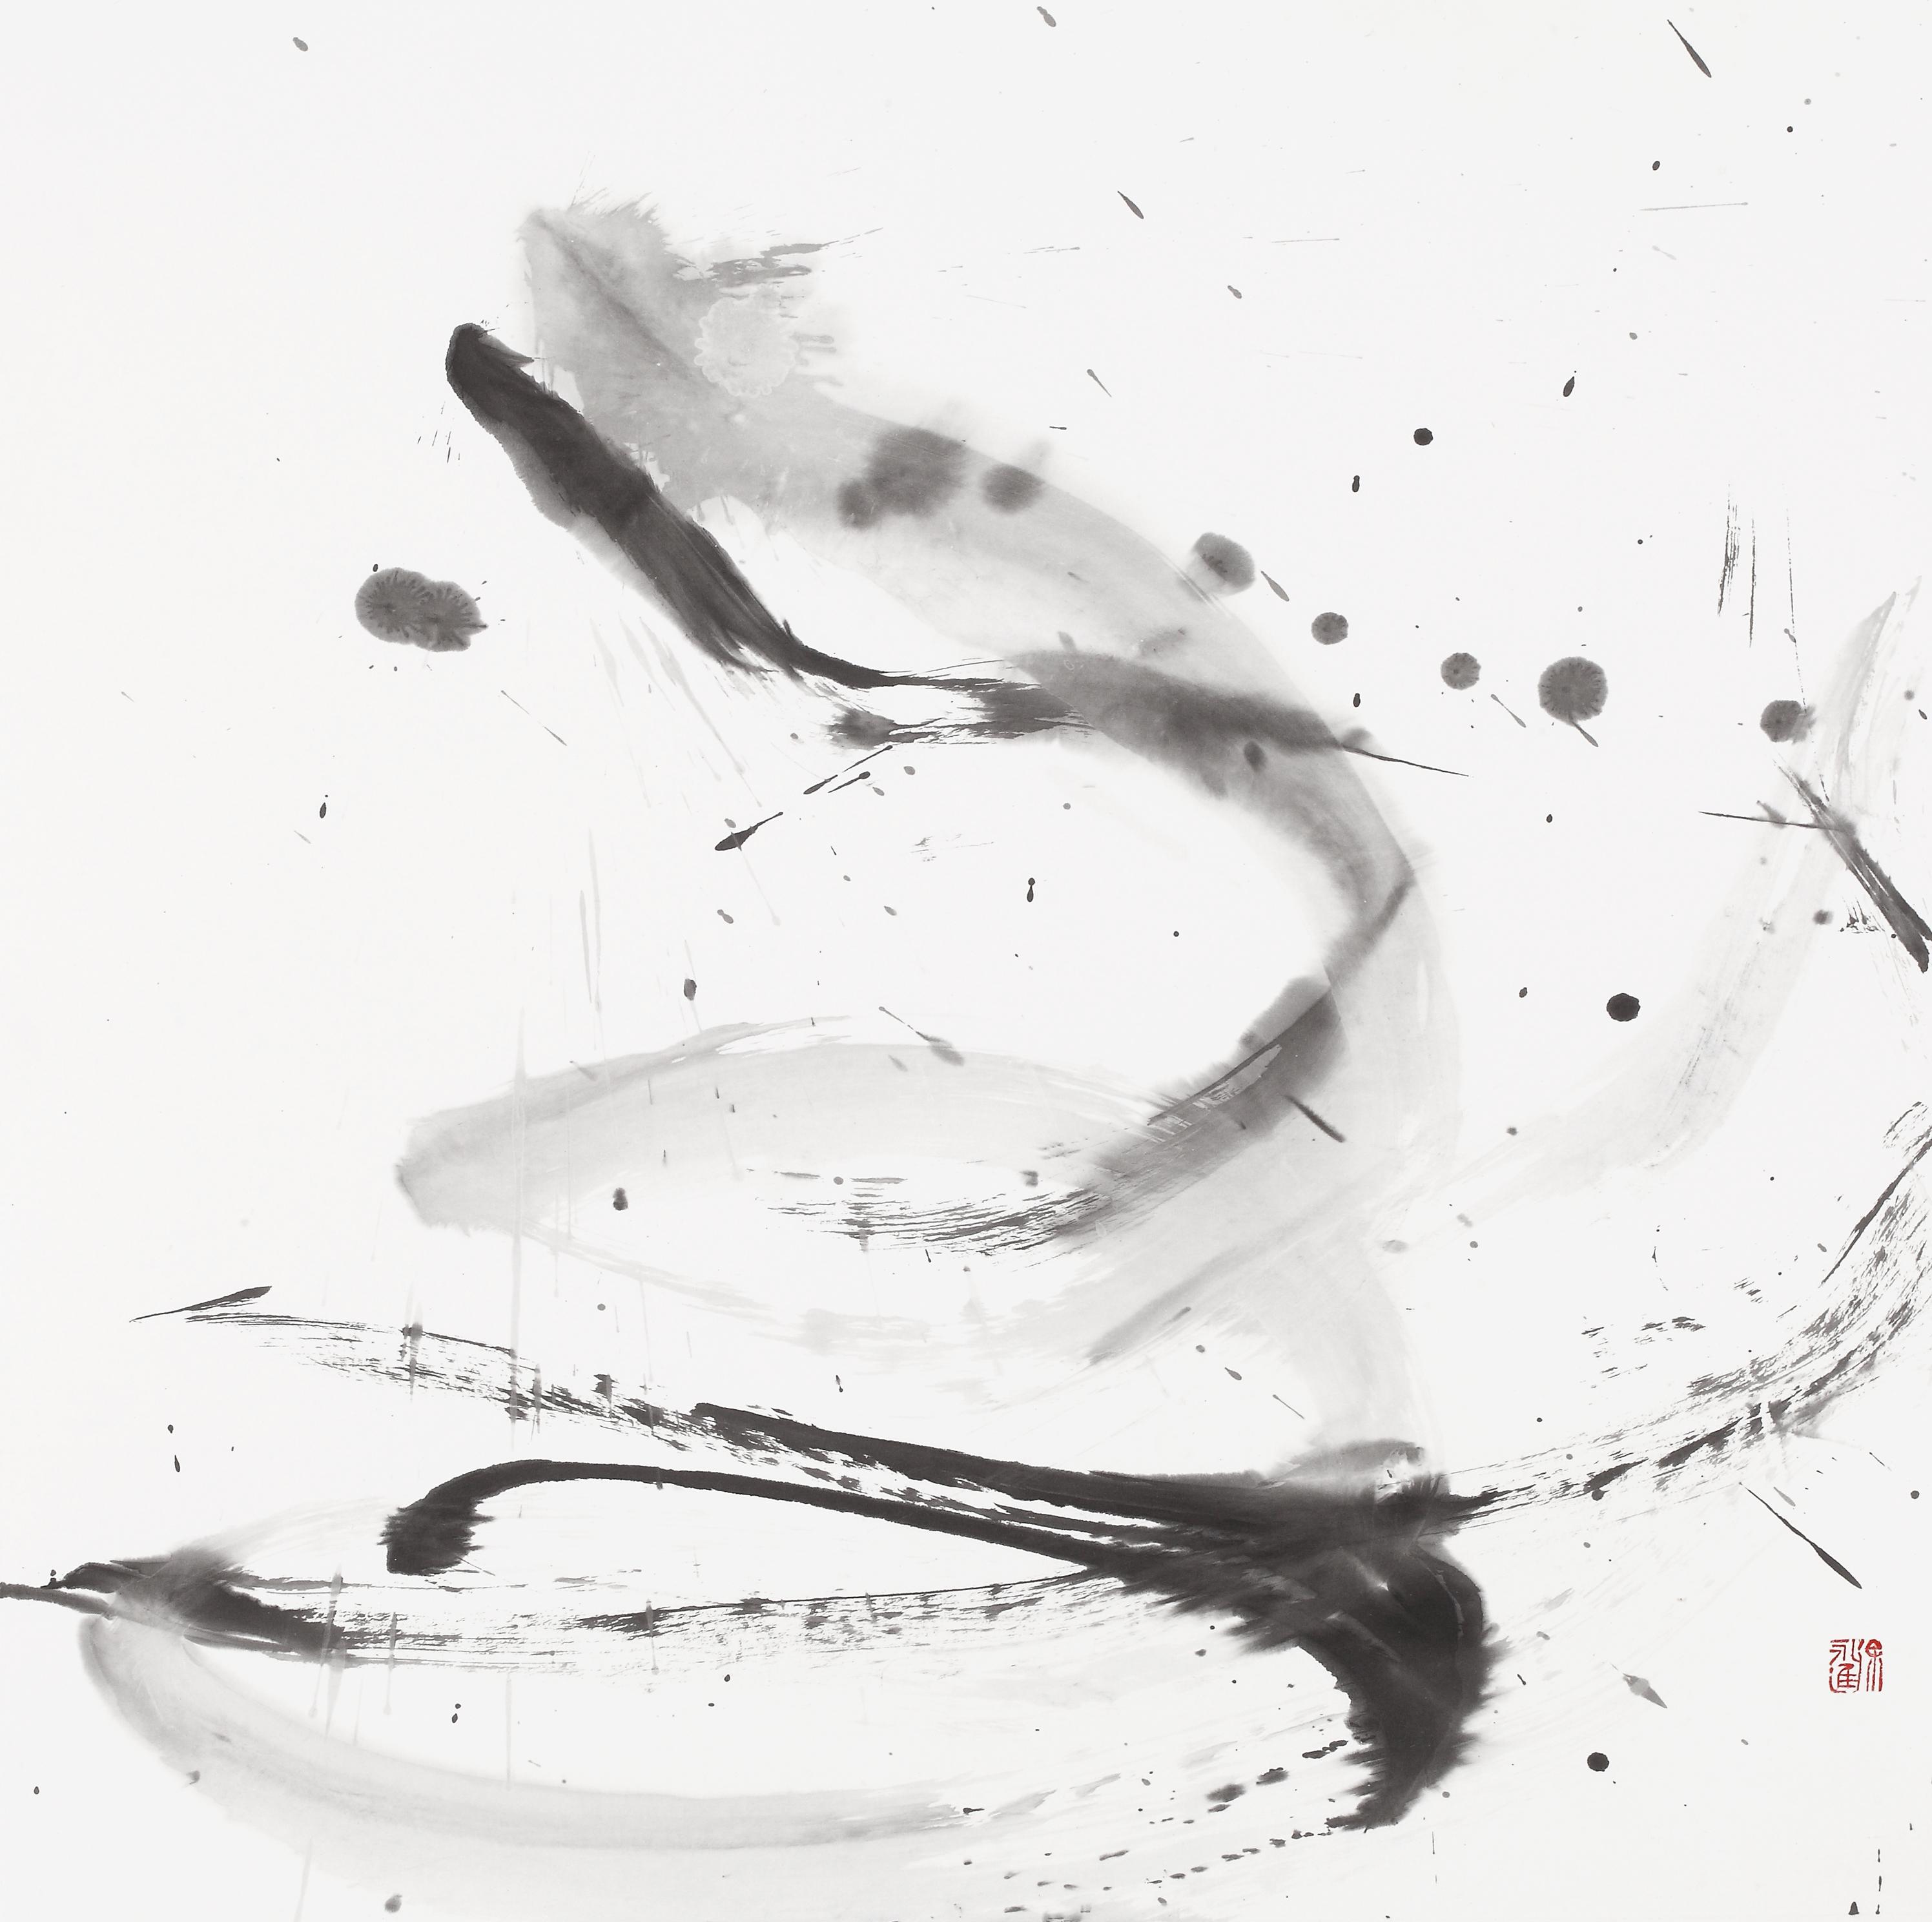 无字心相unword#20